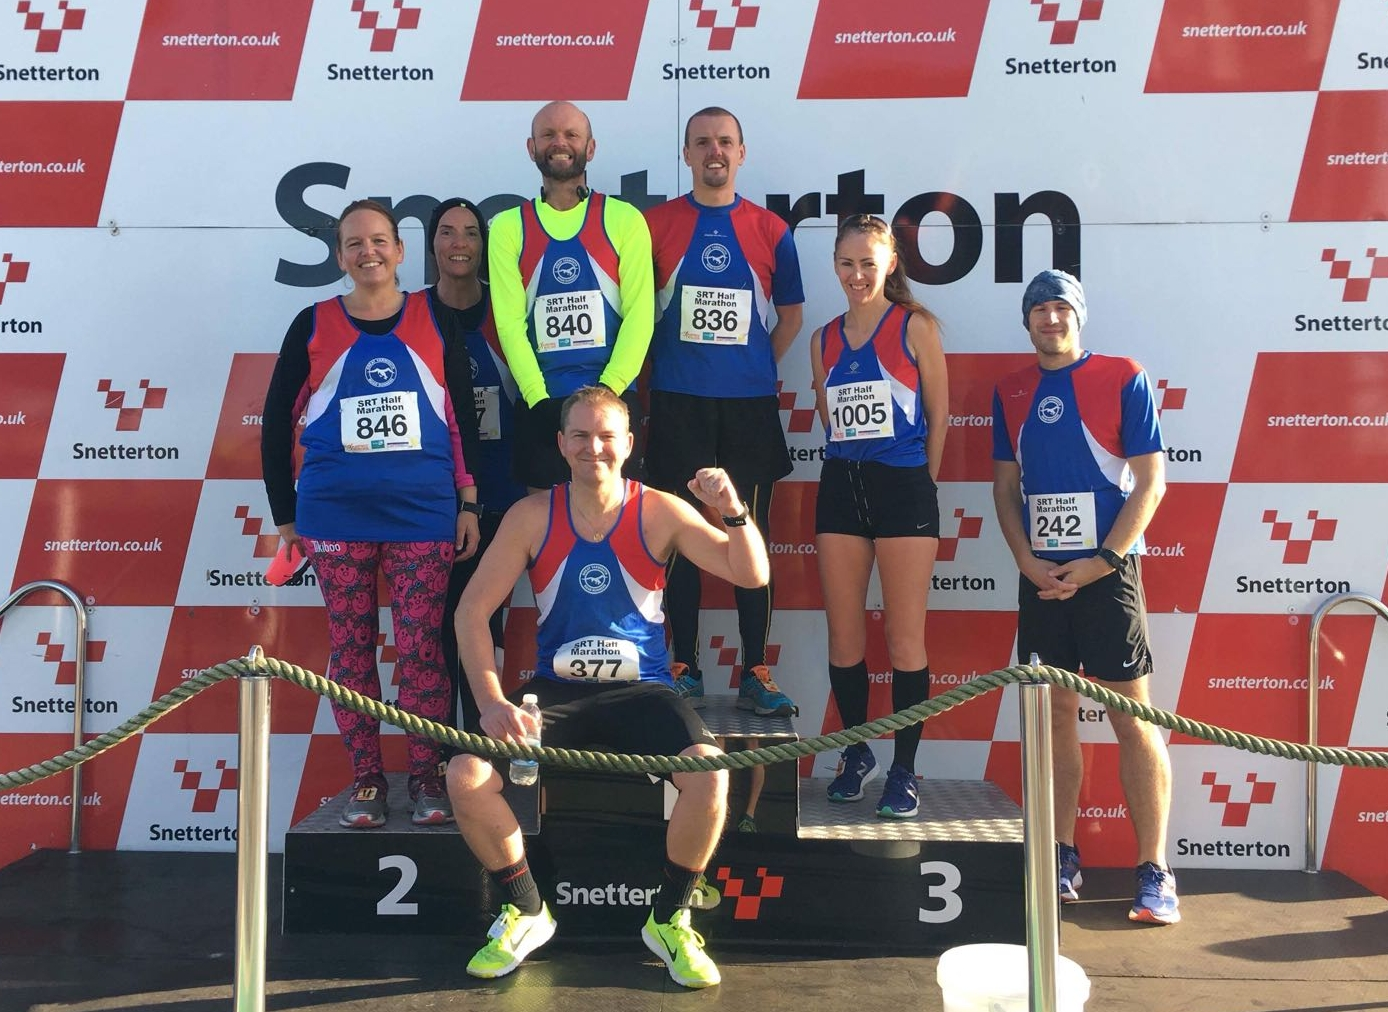 Snetterton Half marathon 19-11-17.jpg